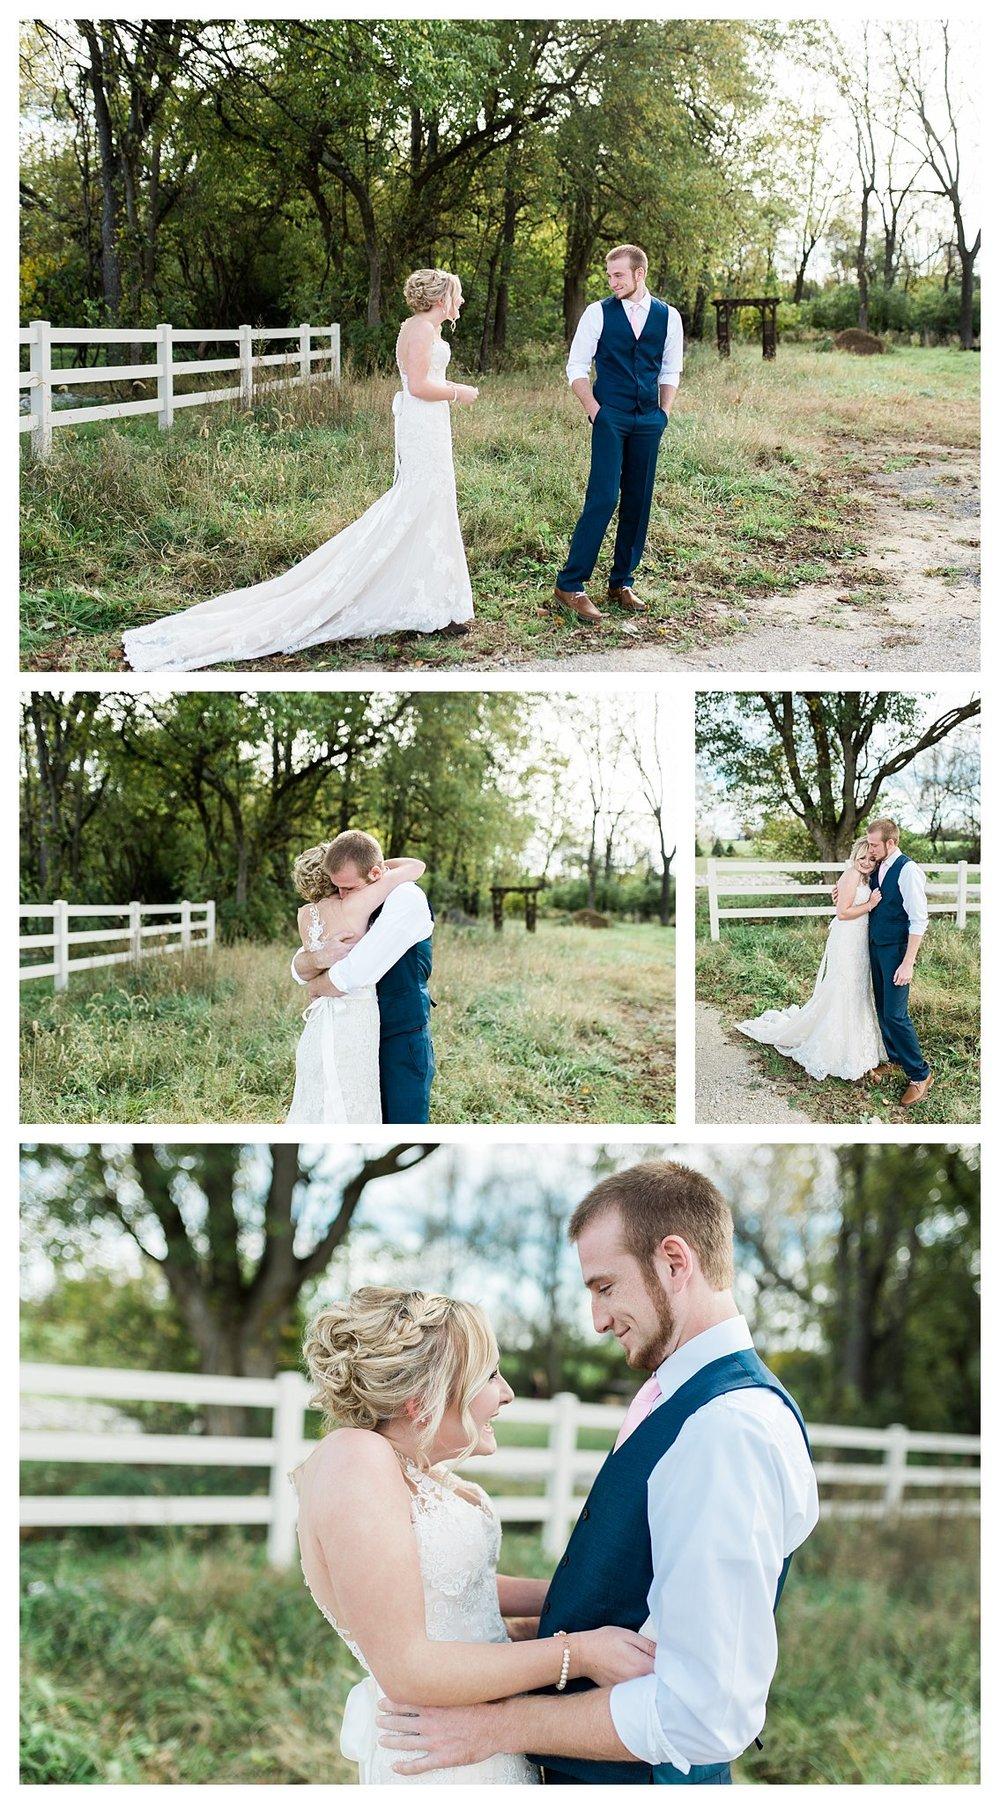 everleigh-photography-cincinnati-wedding-photographer-rolling-meadows-ranch-cincinnati-wedding-photography-wedding-photo-ideas-kristin-and-keegan11